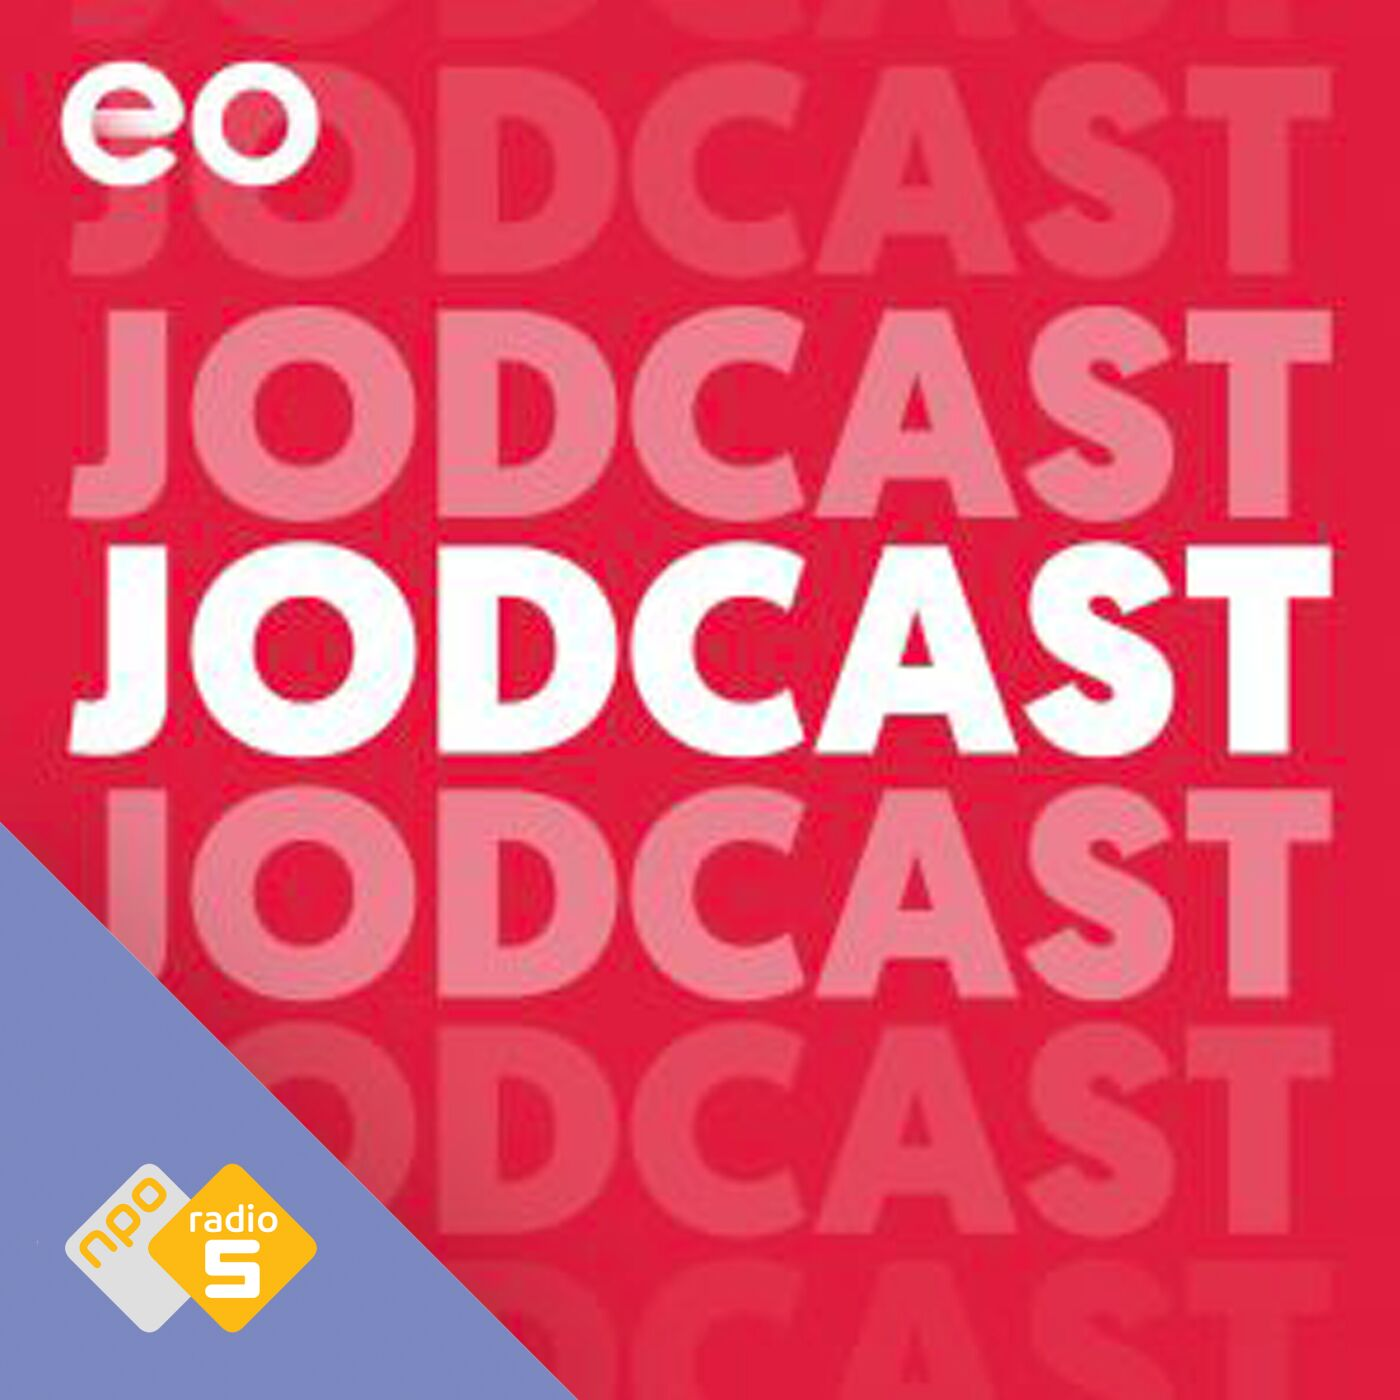 De Jodcast logo